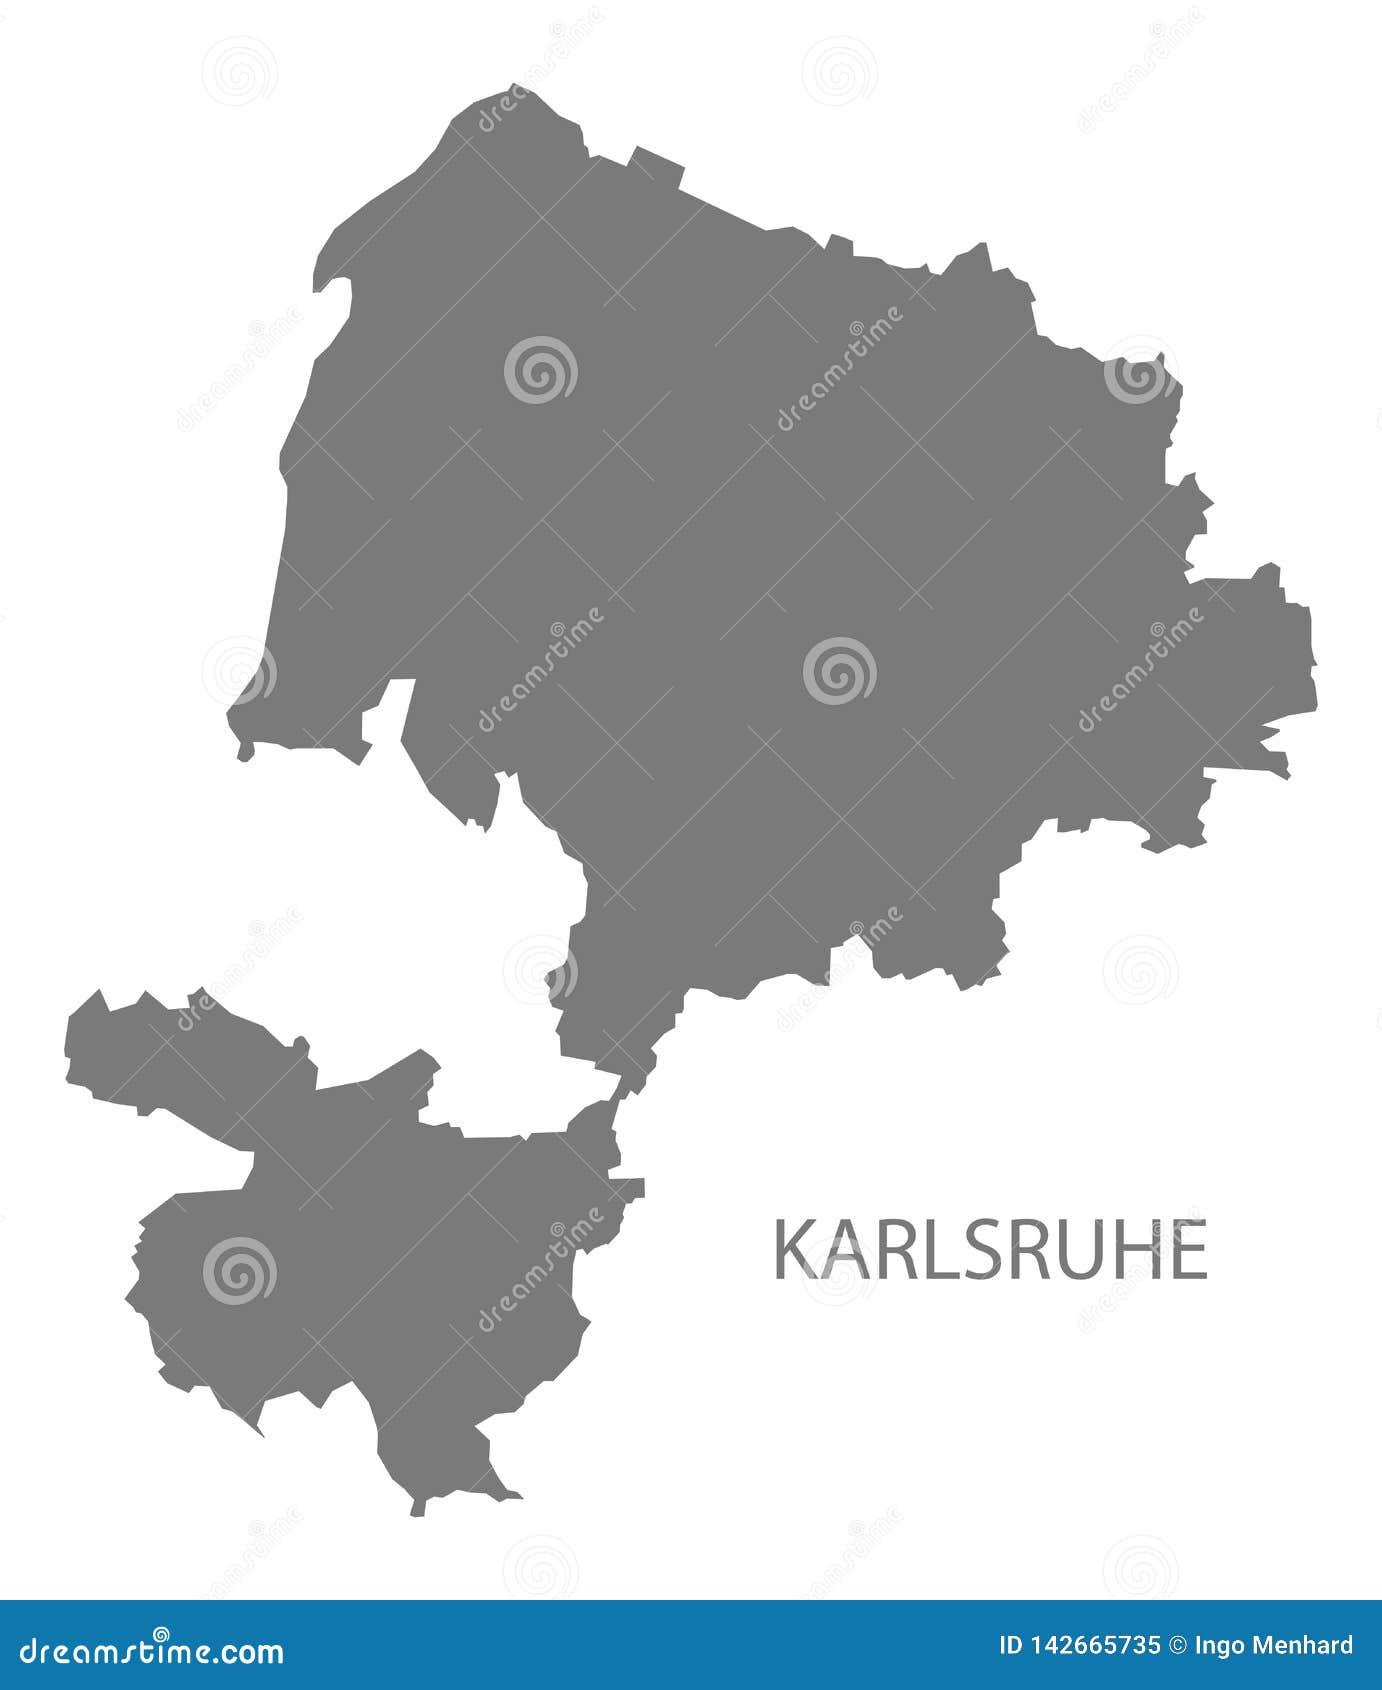 Map Of Germany Karlsruhe Baden.Karlsruhe County Map Of Baden Wuerttemberg Germany Stock Vector